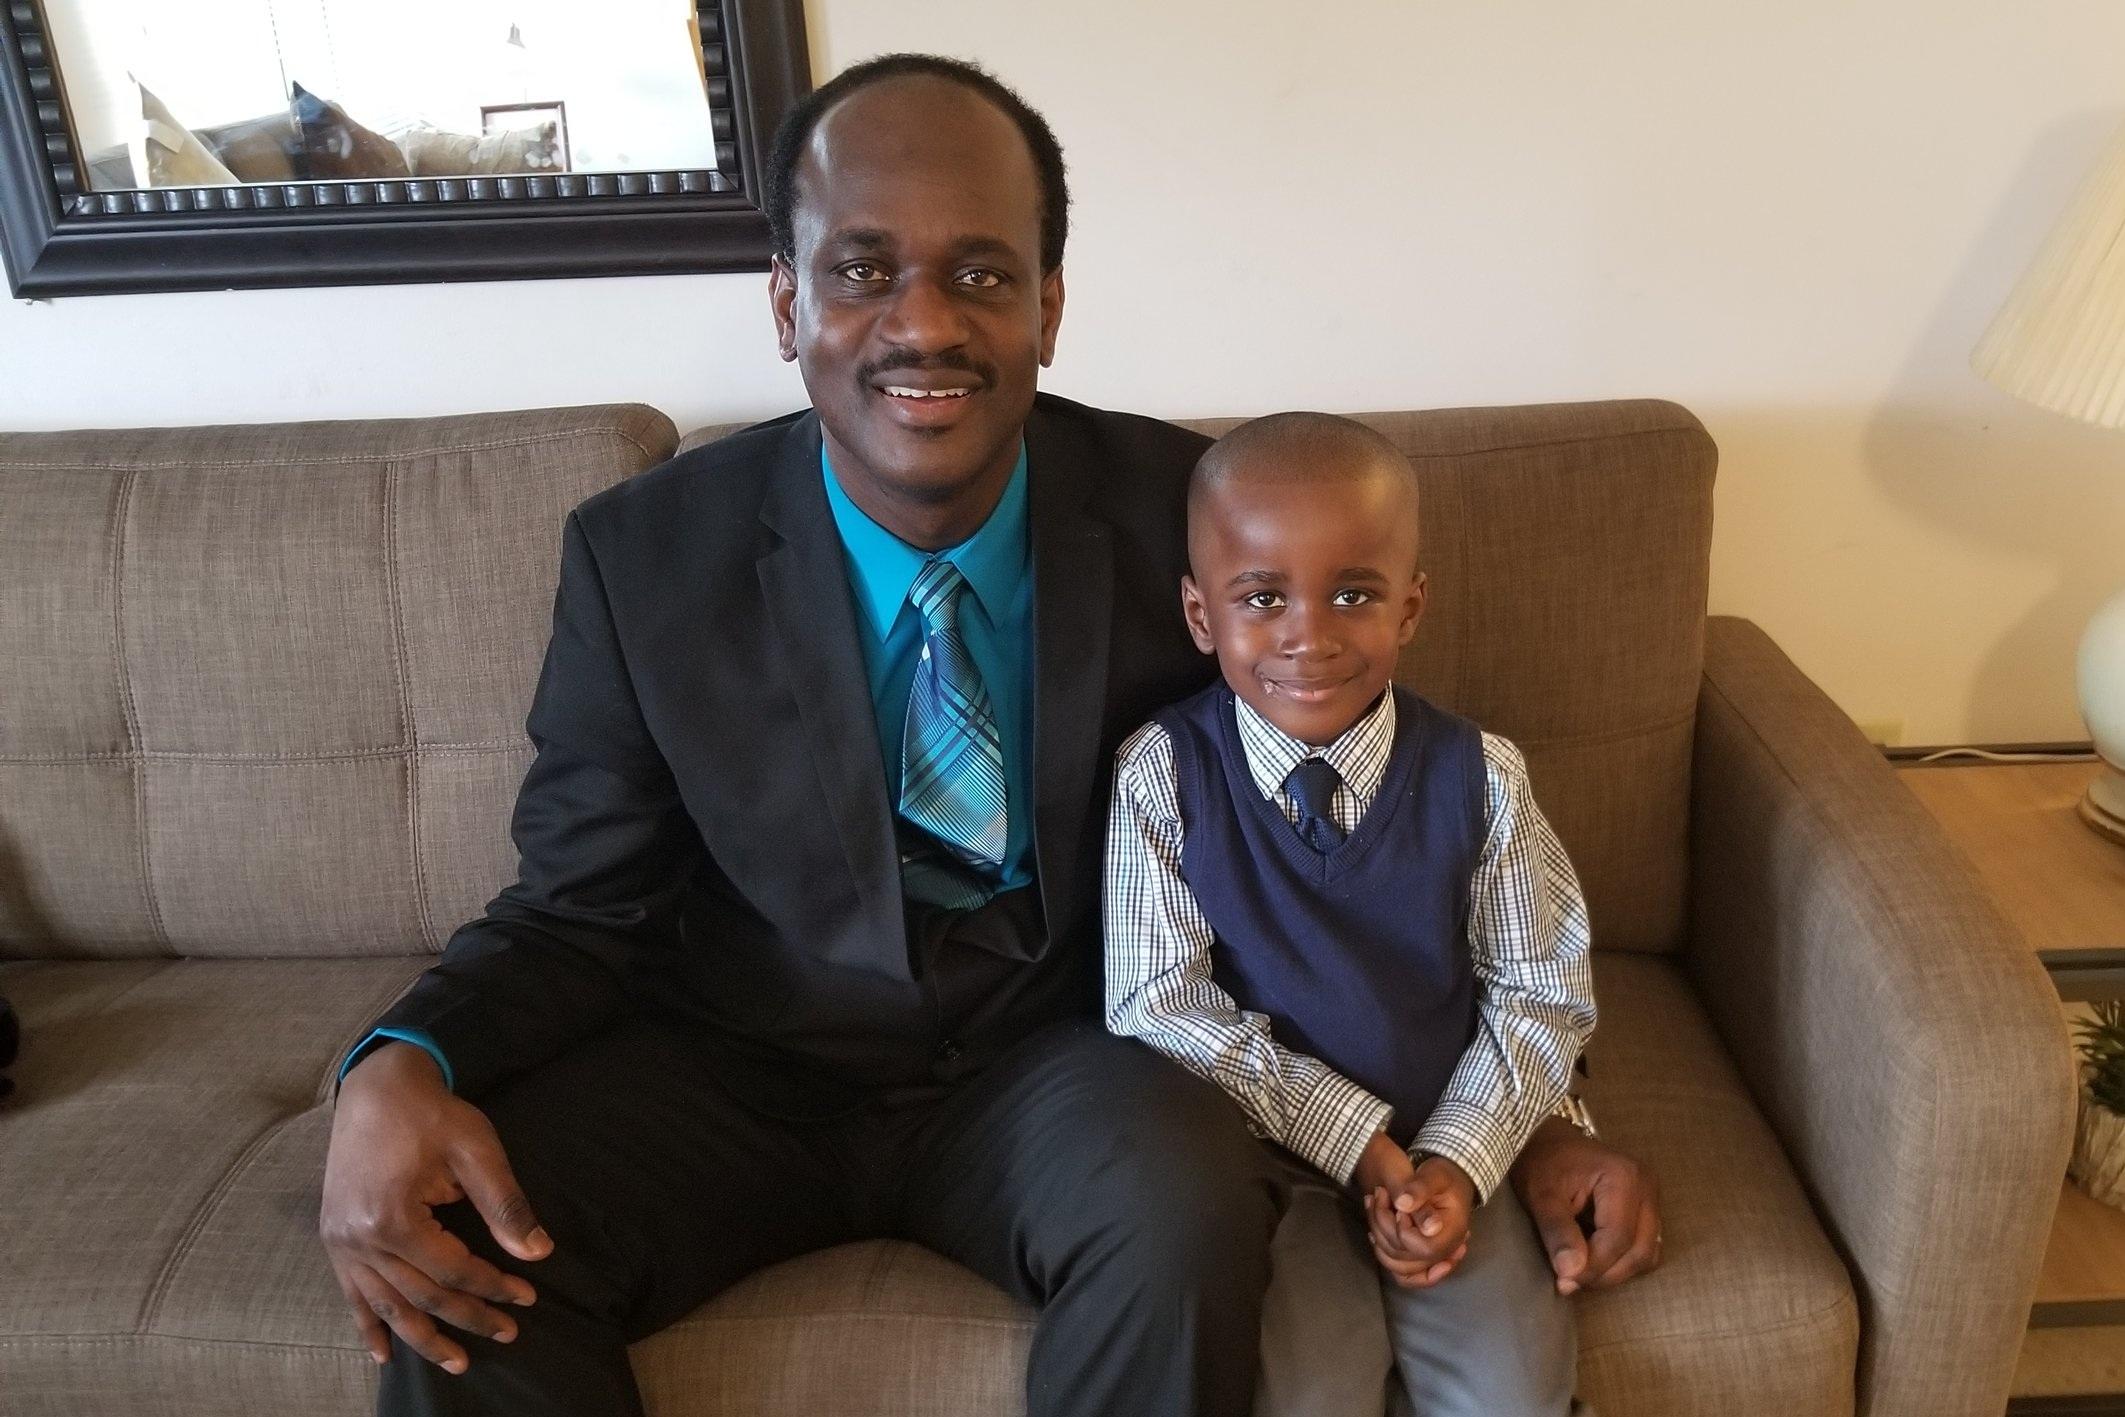 Raxon and his son Raxlander.